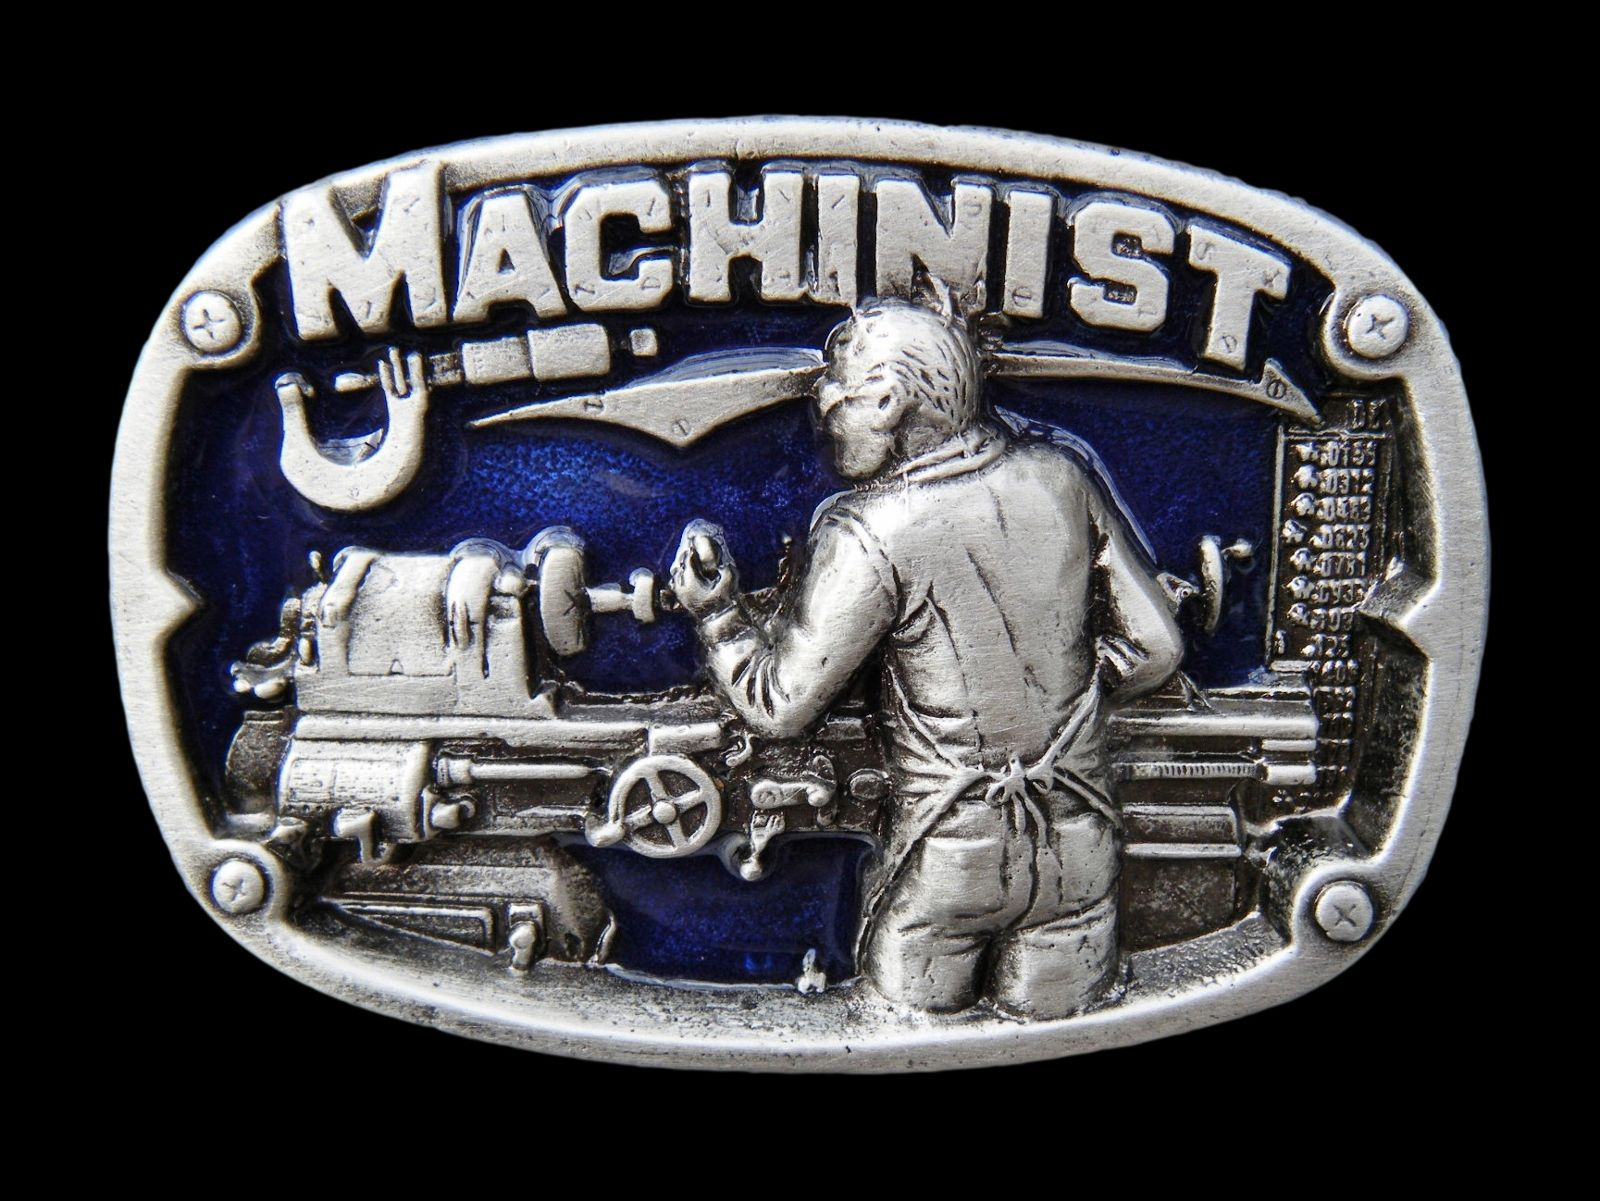 MACHINIST MACHINE OPERATOR TOOLS BELT BELTS BUCKLE BUCKLES